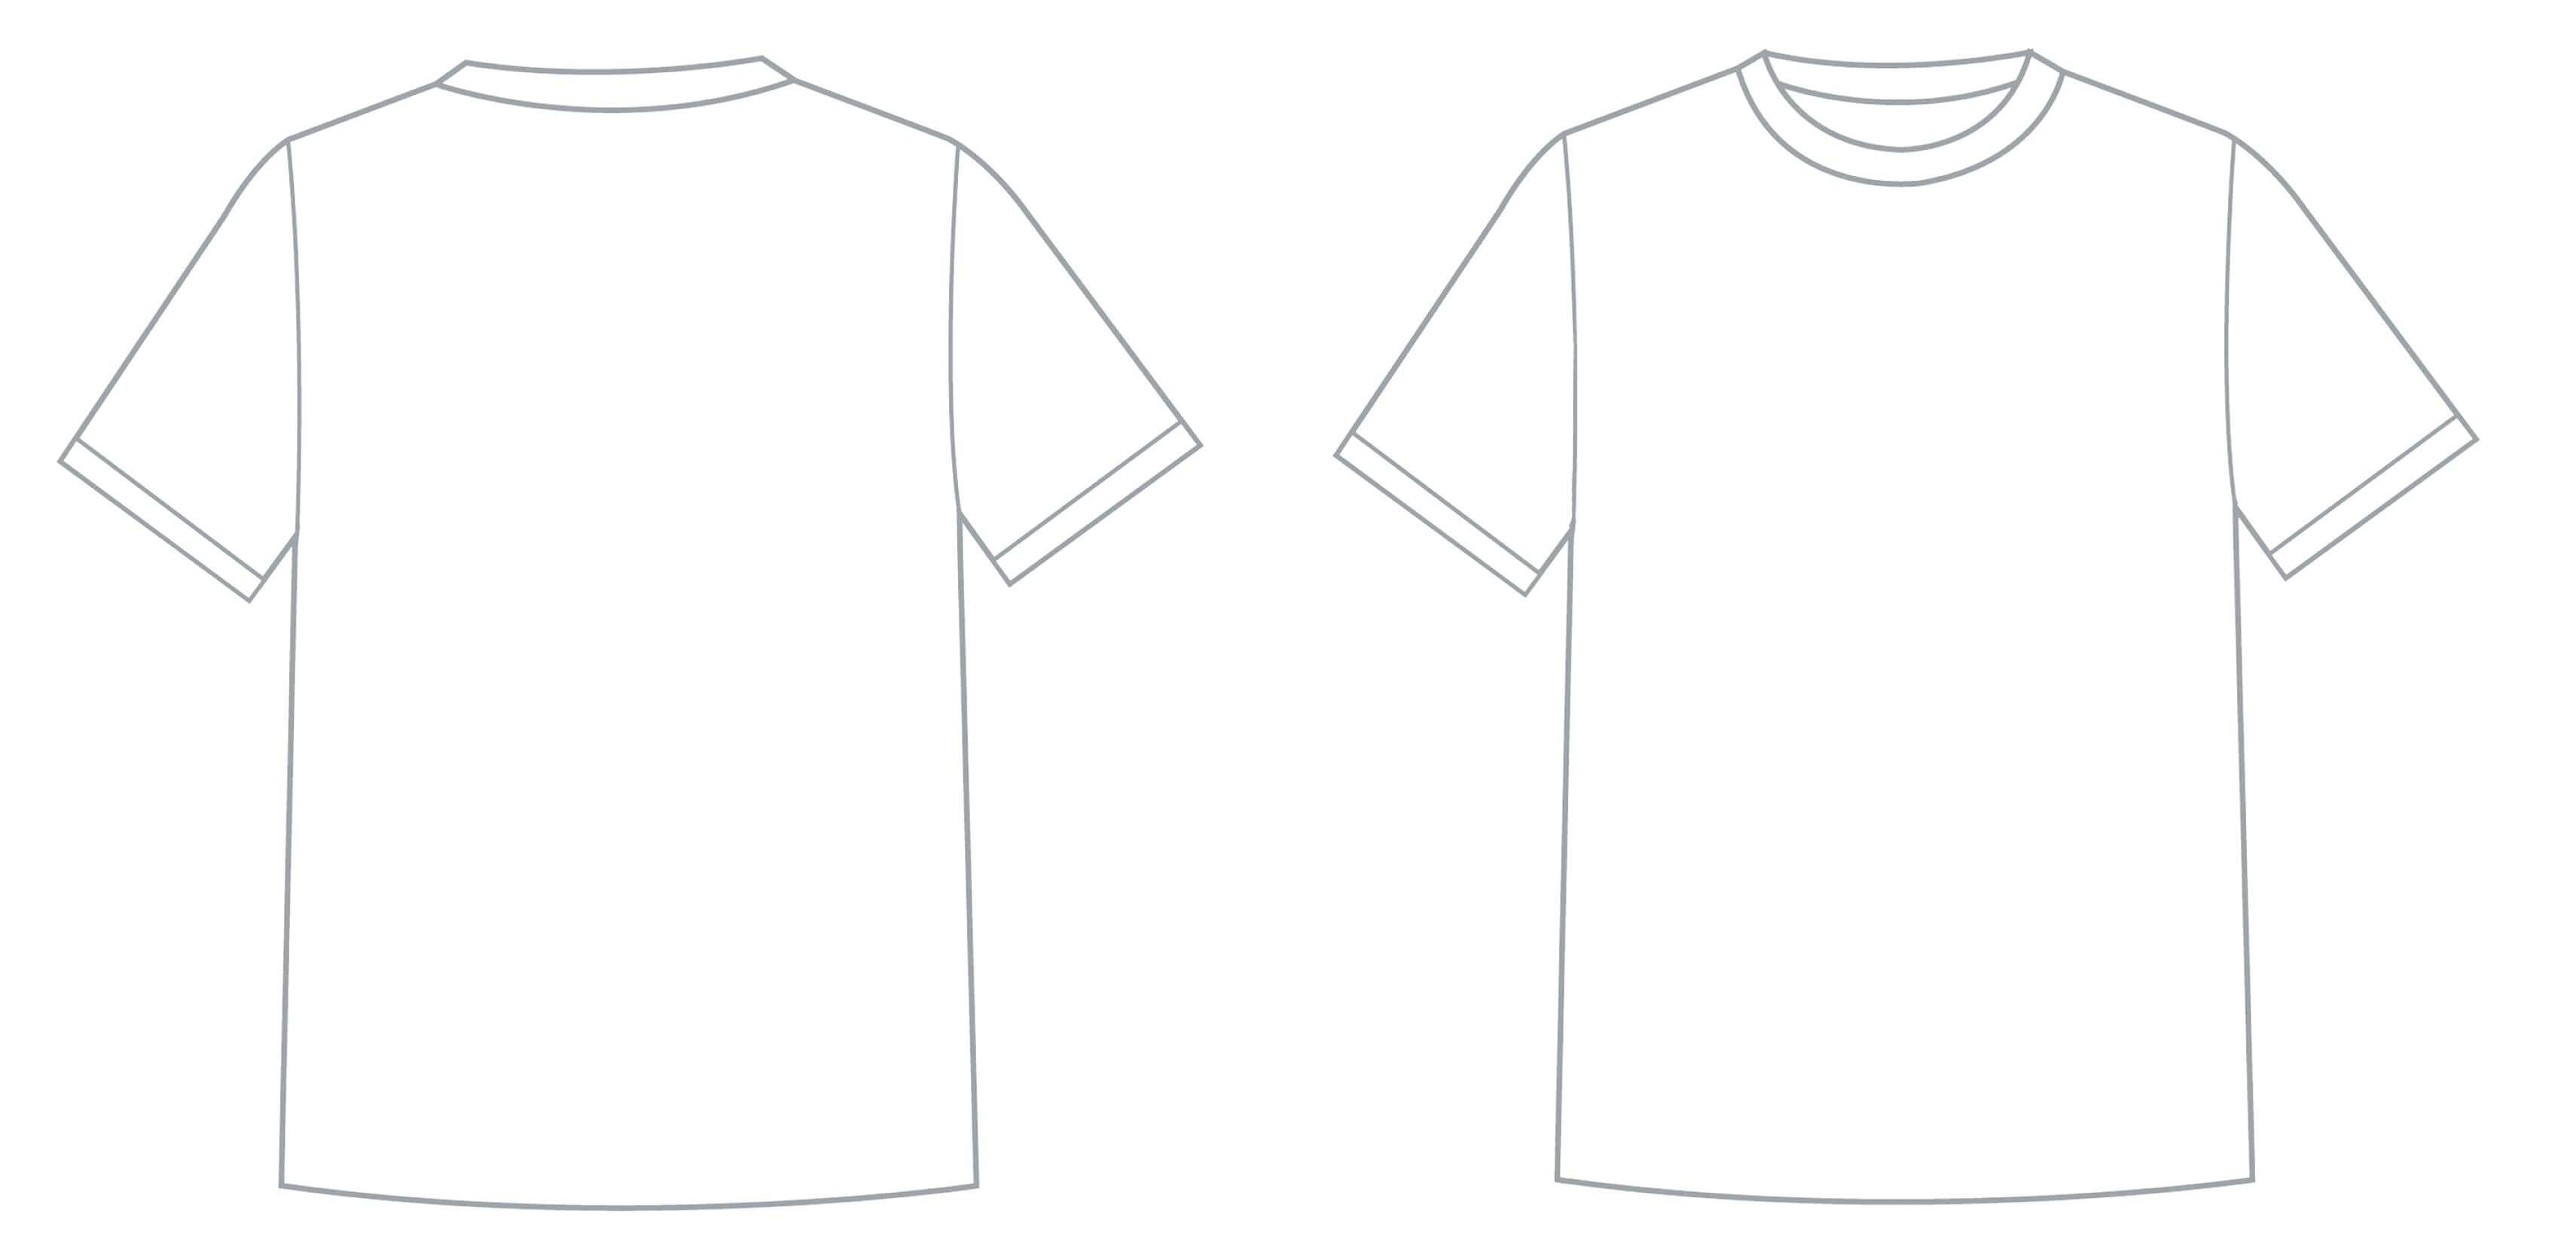 Template: Blank Vector Tee Shirts T Shirt Template Printable within Blank Tshirt Template Printable